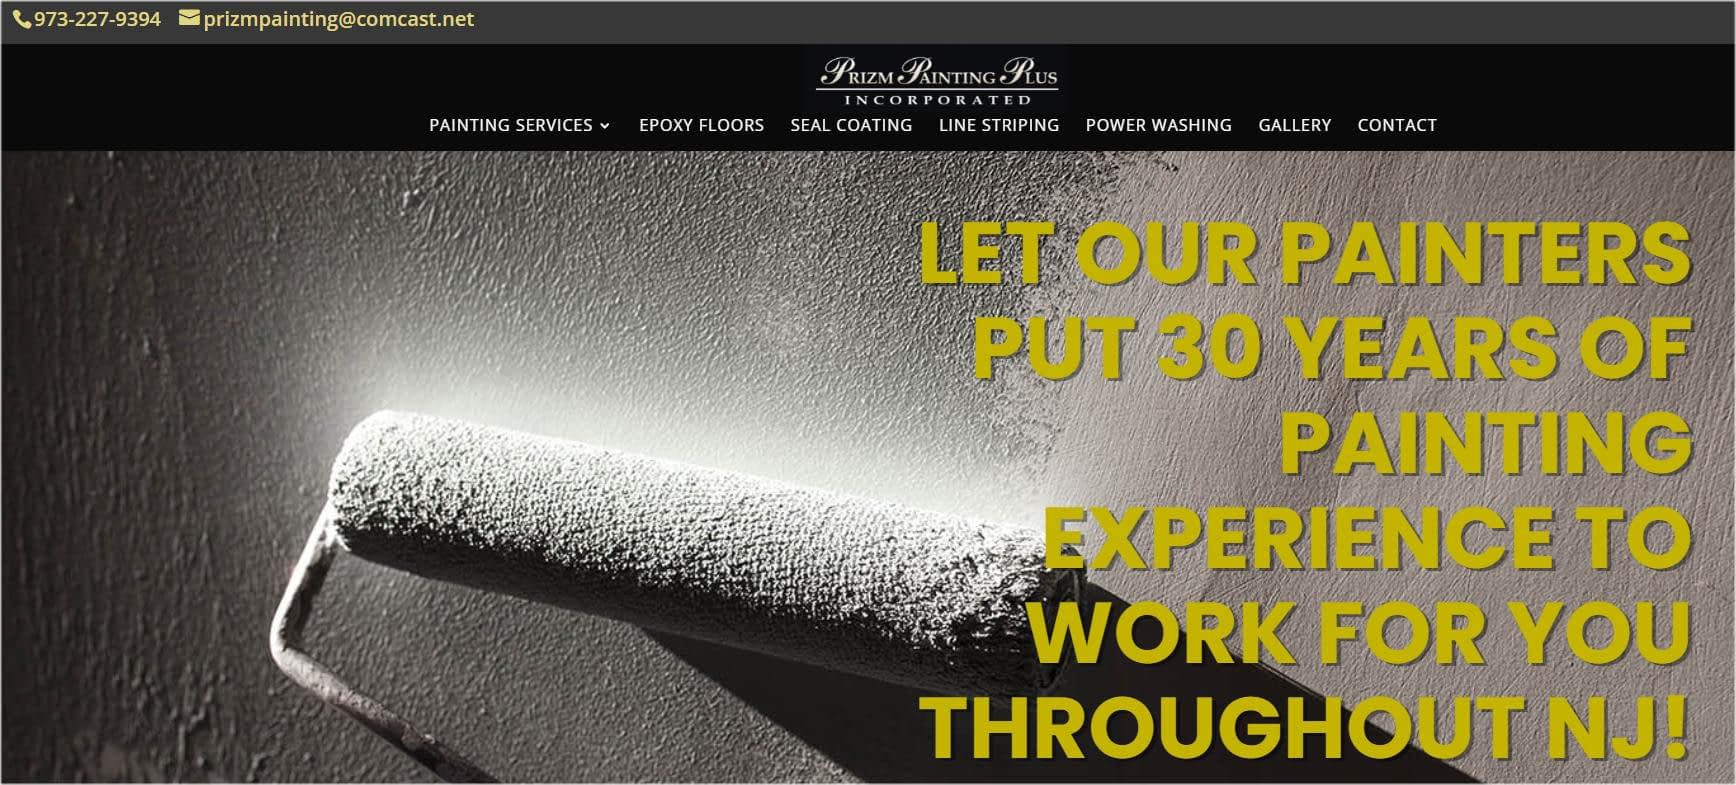 website design NJ